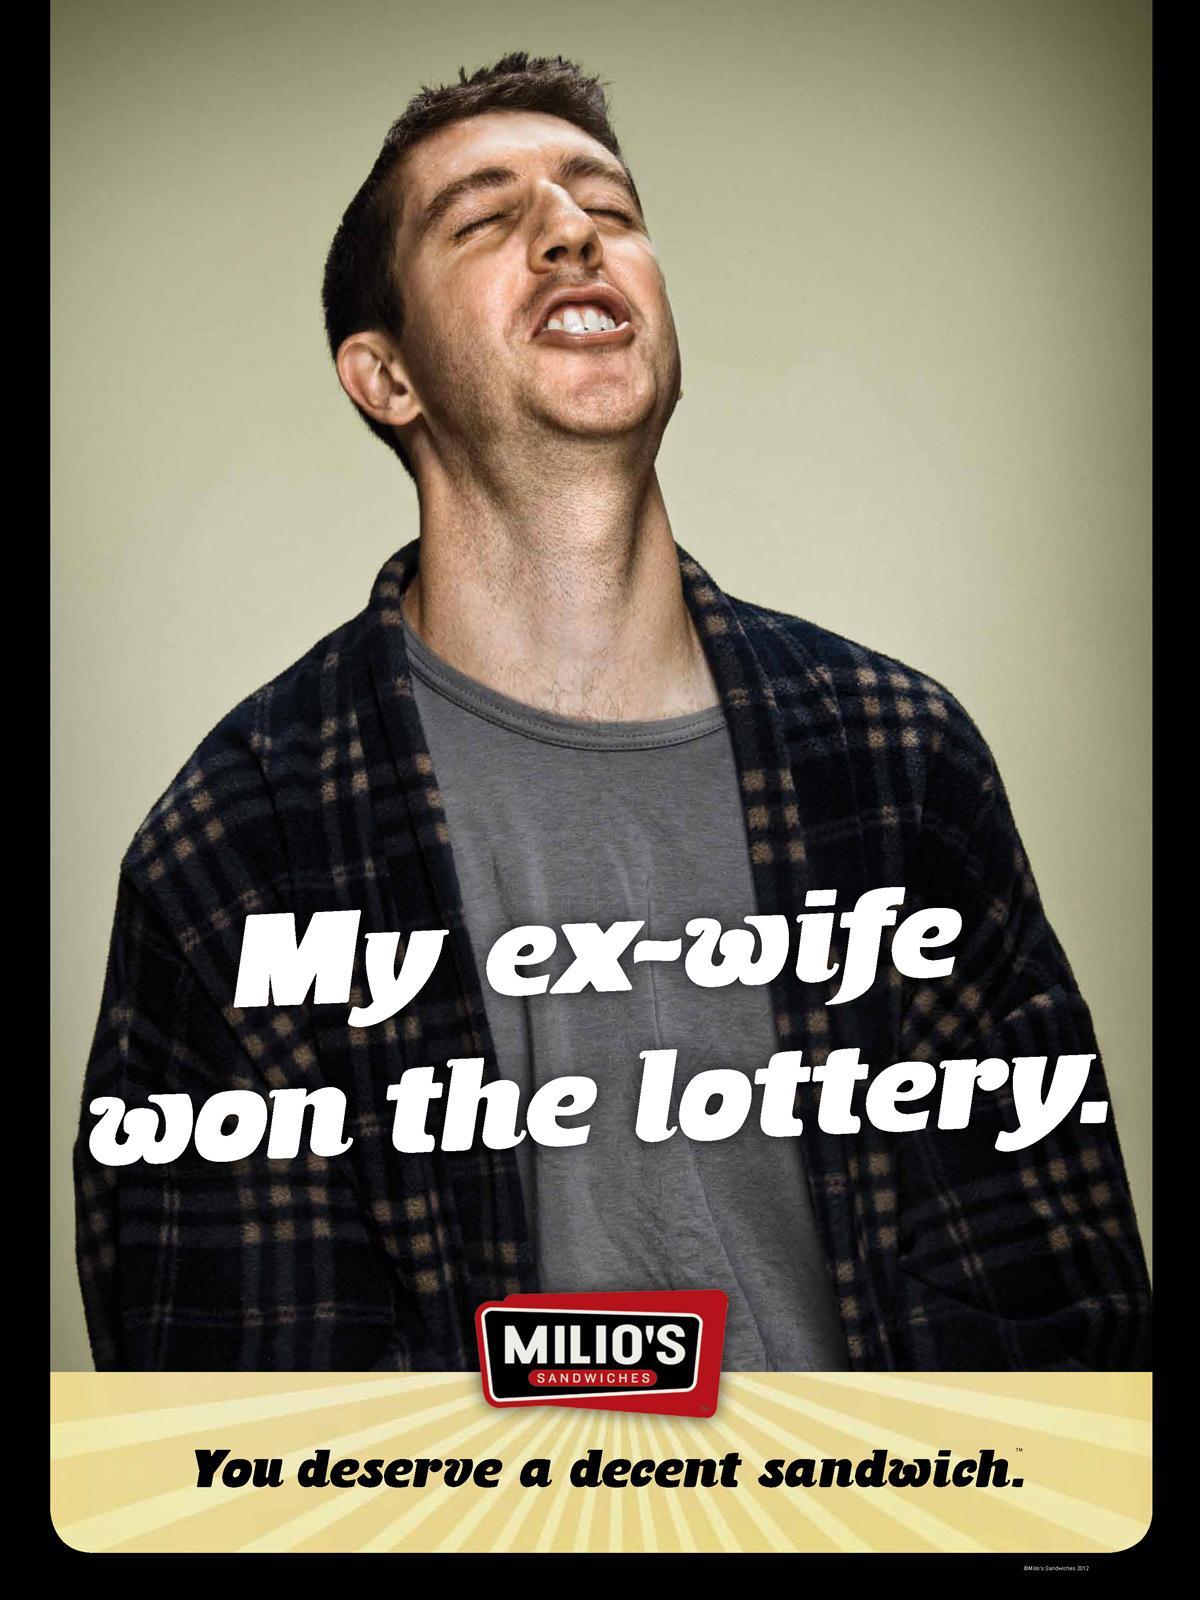 Milio's Sandwiches Print Ad -  Ex-wife